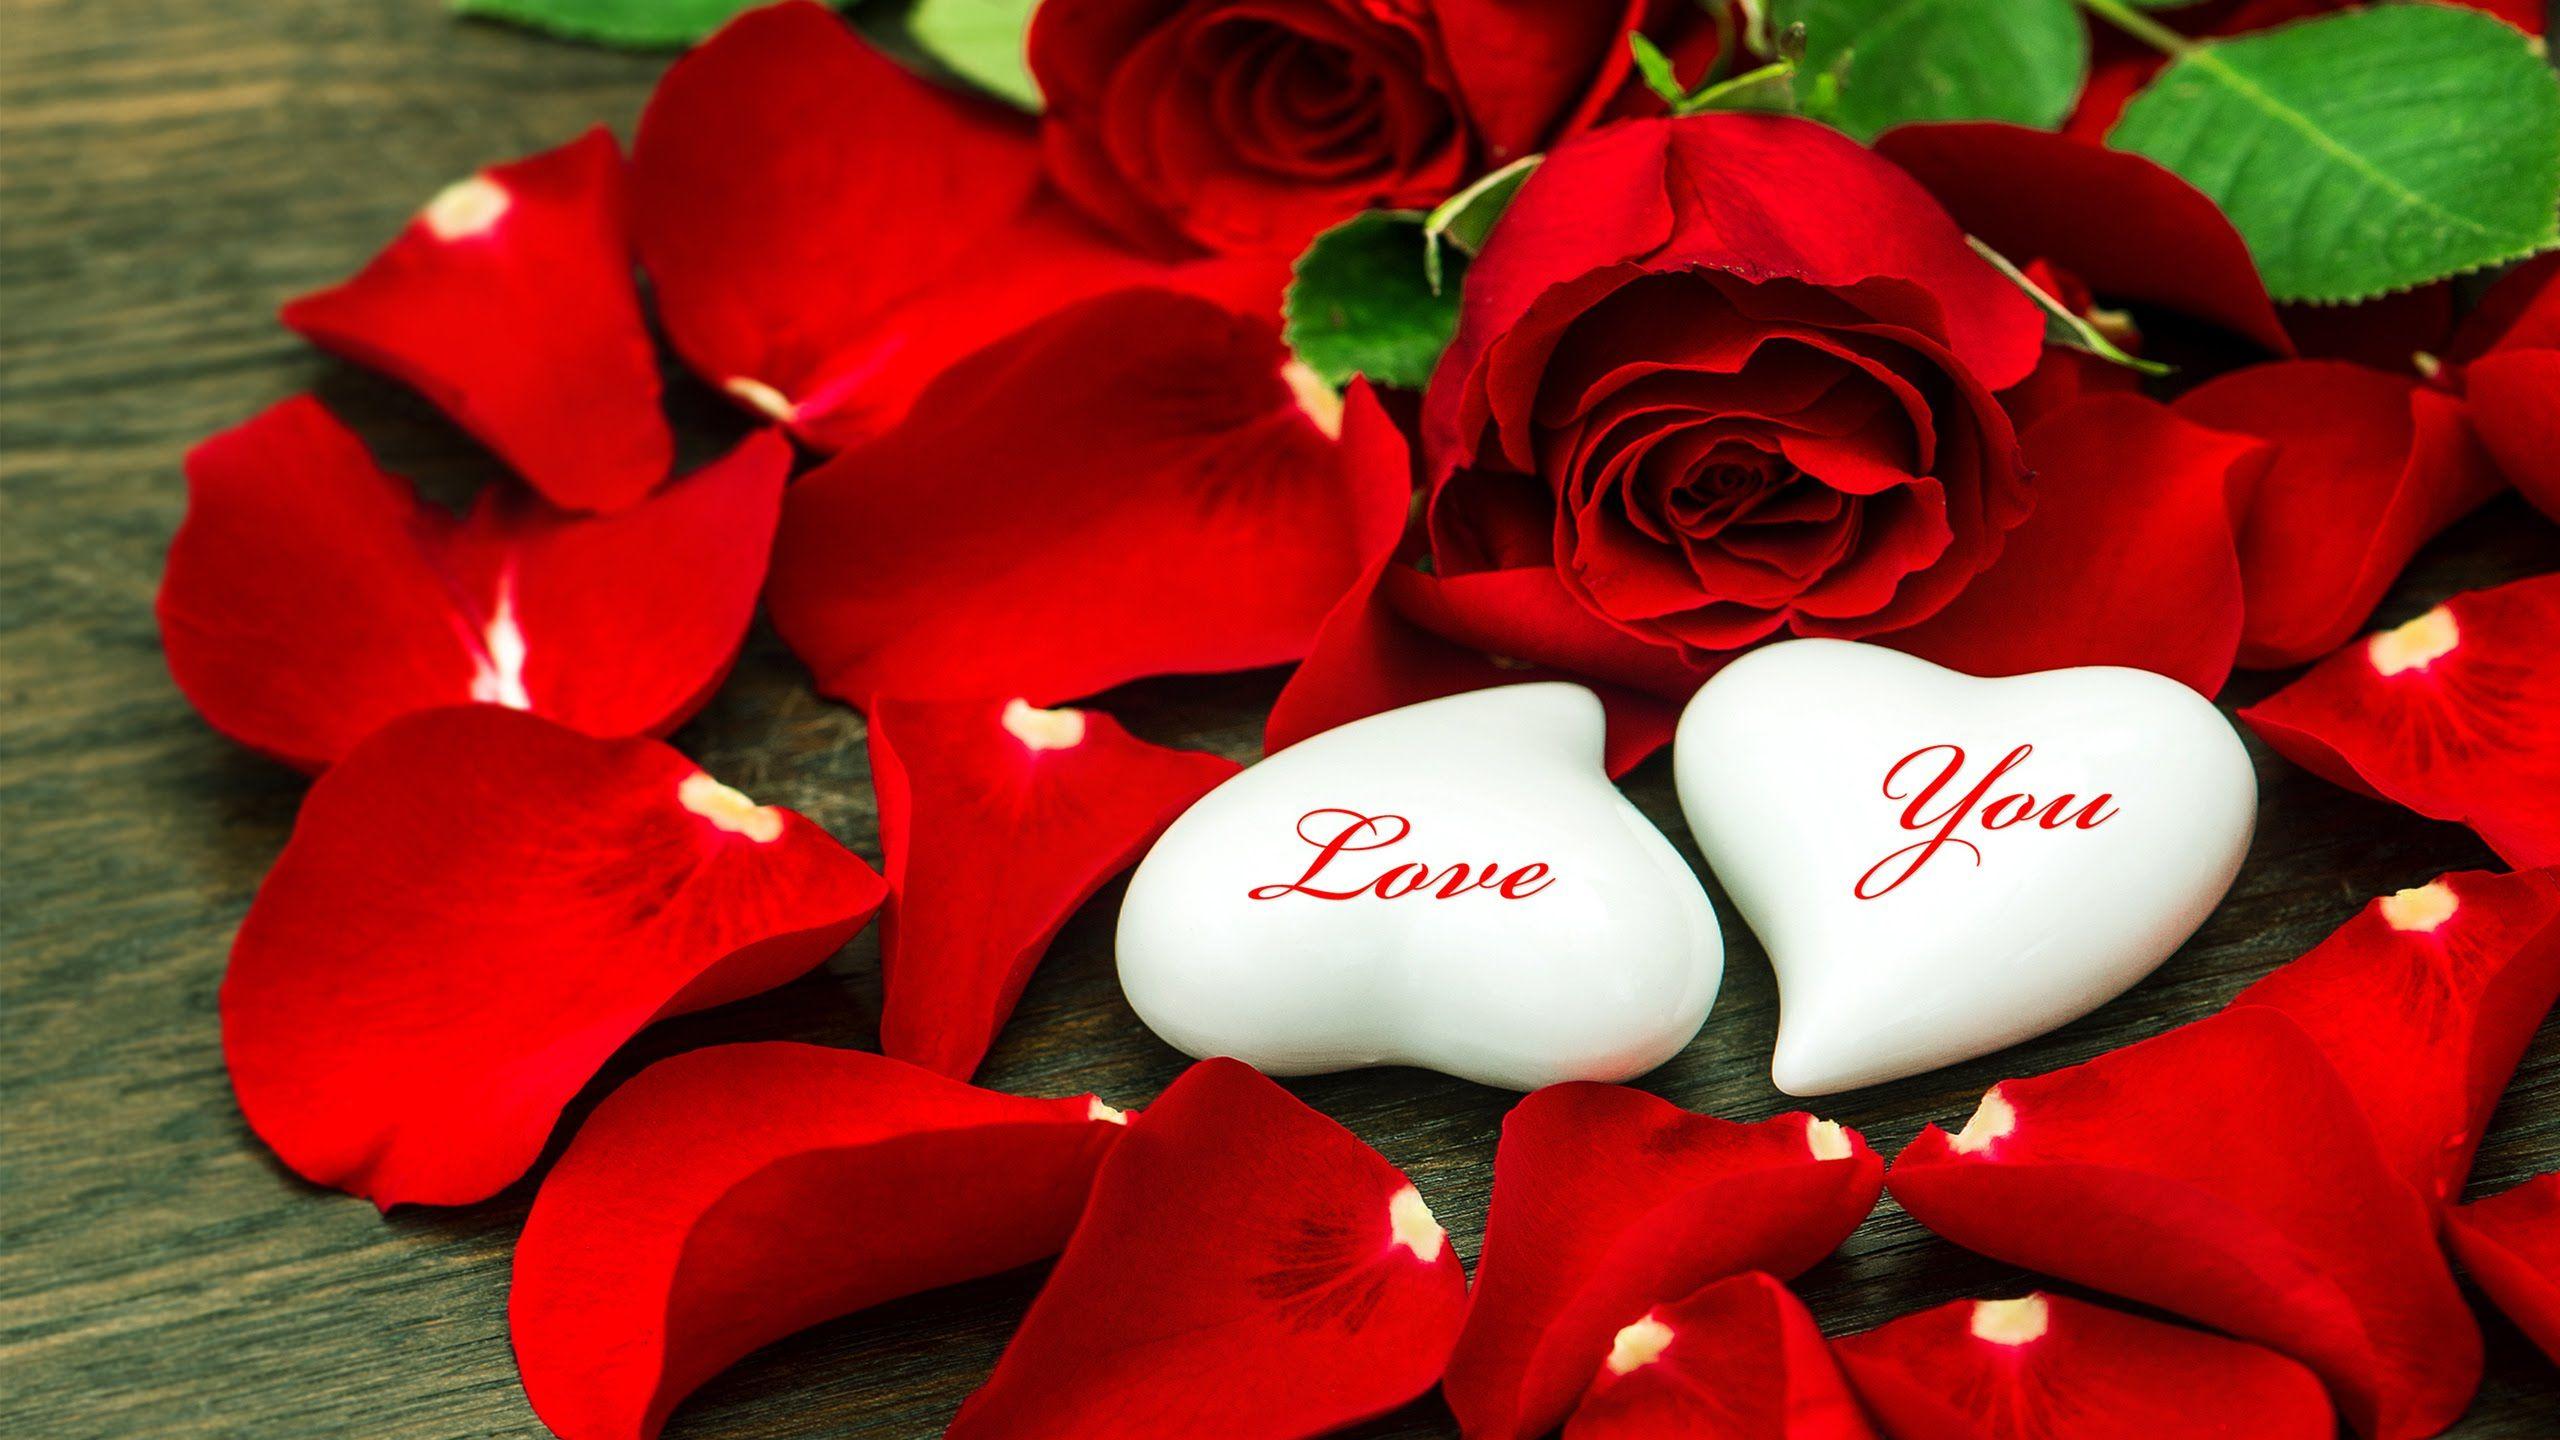 Love Song Endless Love The Best Relaxing Music Hd 1080p Flower Wallpaper Love Flowers Love Wallpaper